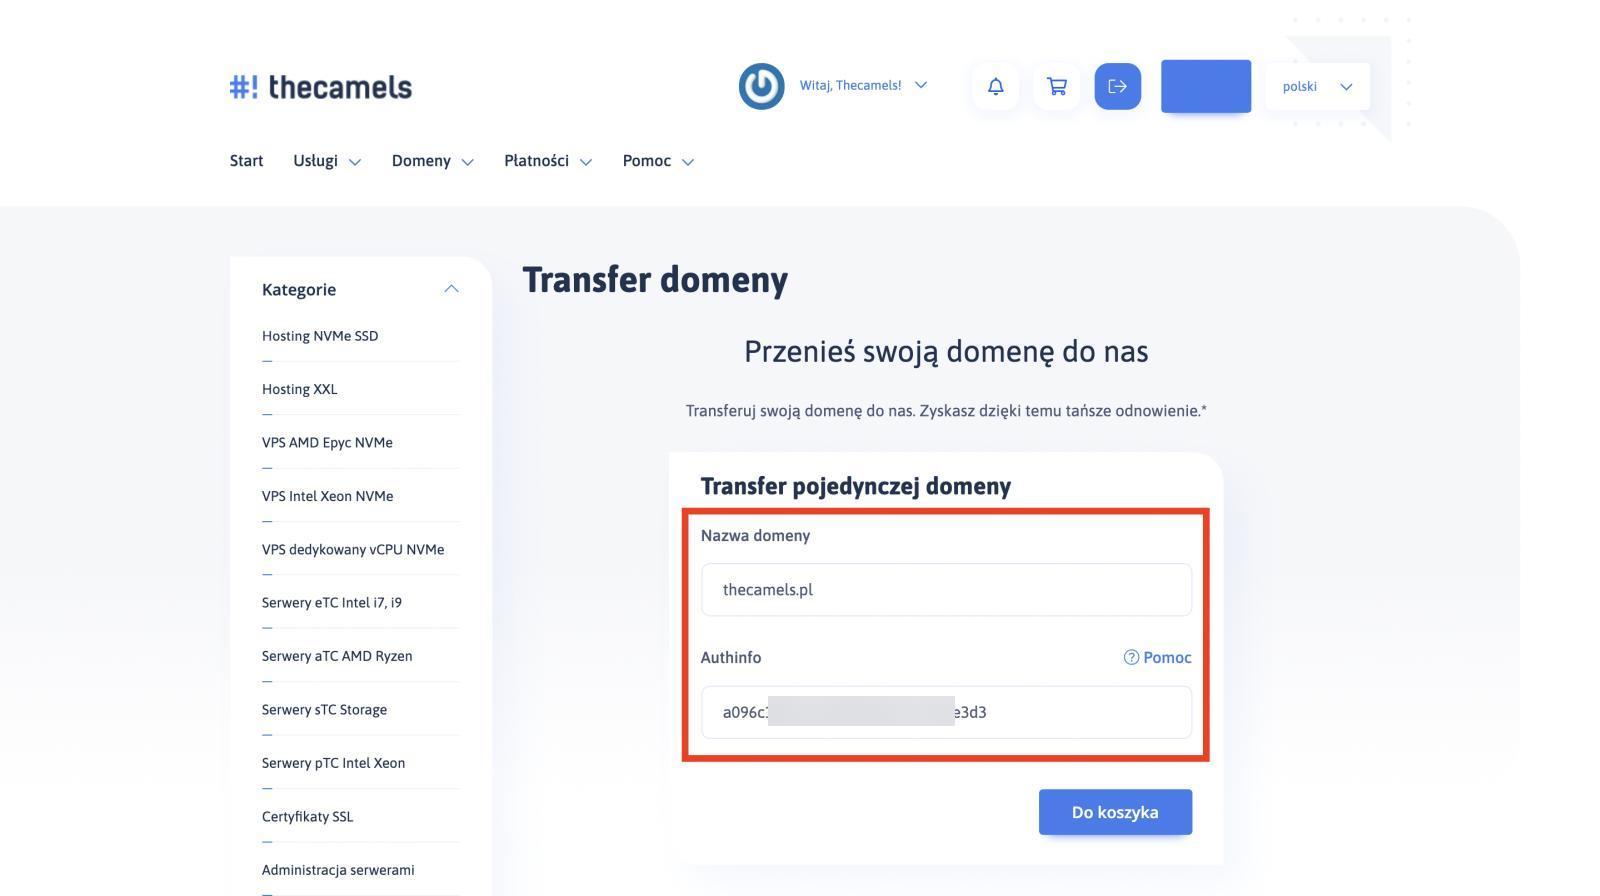 Panel klienta - transfer domeny